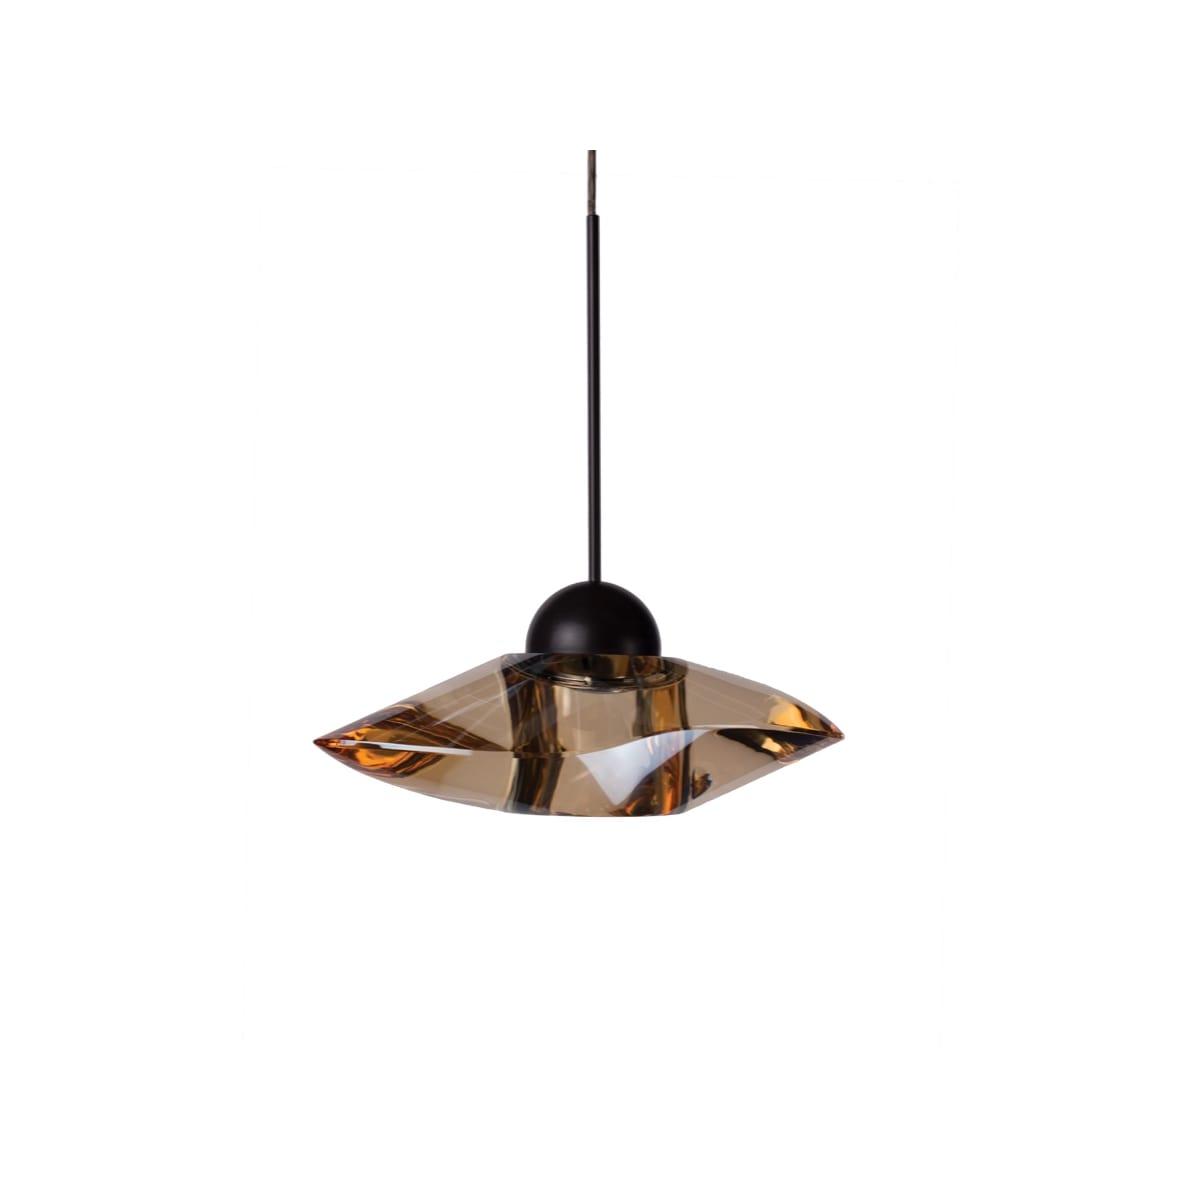 Varaluz 263m01rplgl Posh 1 Light 7 Inch Plum And Gold Leaf Mini Pendant Ceiling